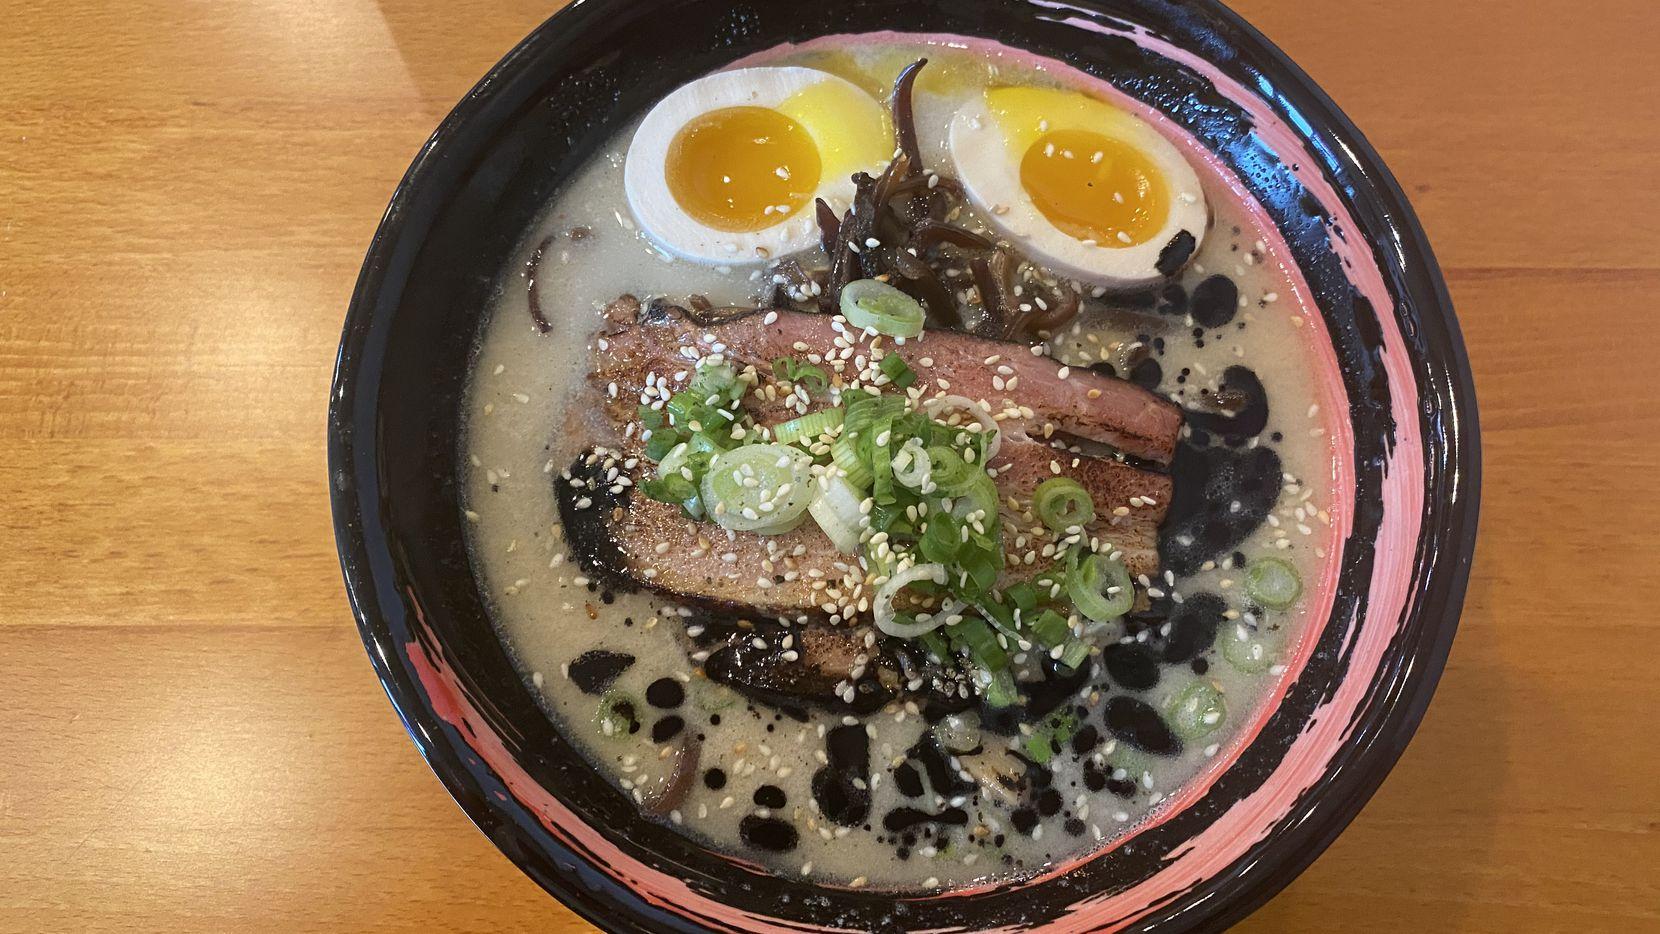 The tonkotsu at Kintaro in Arlington